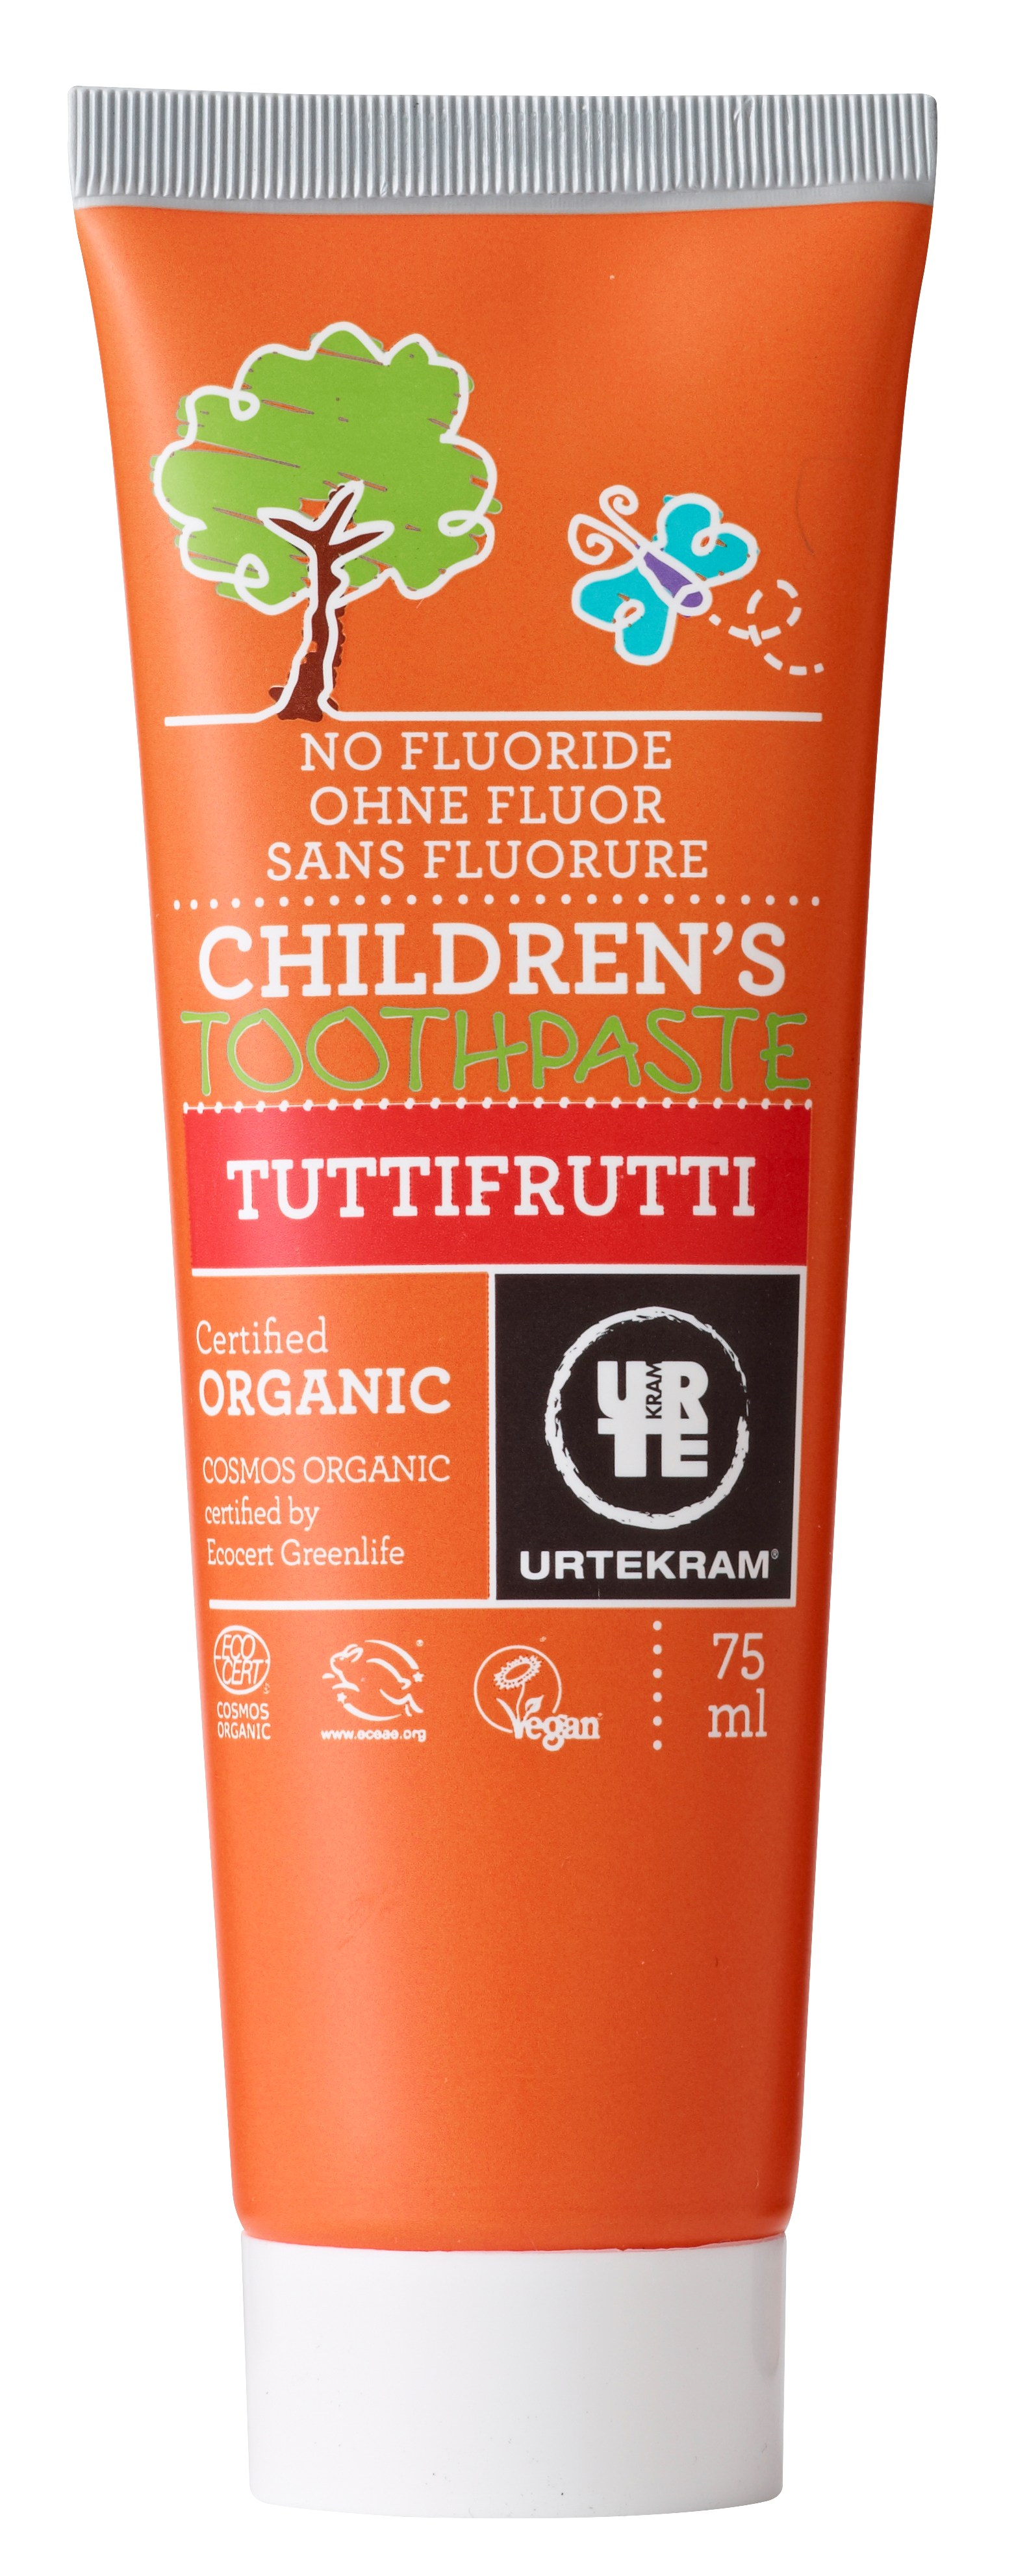 Urtekram Tandpasta TuttiFrutti - 75 ml